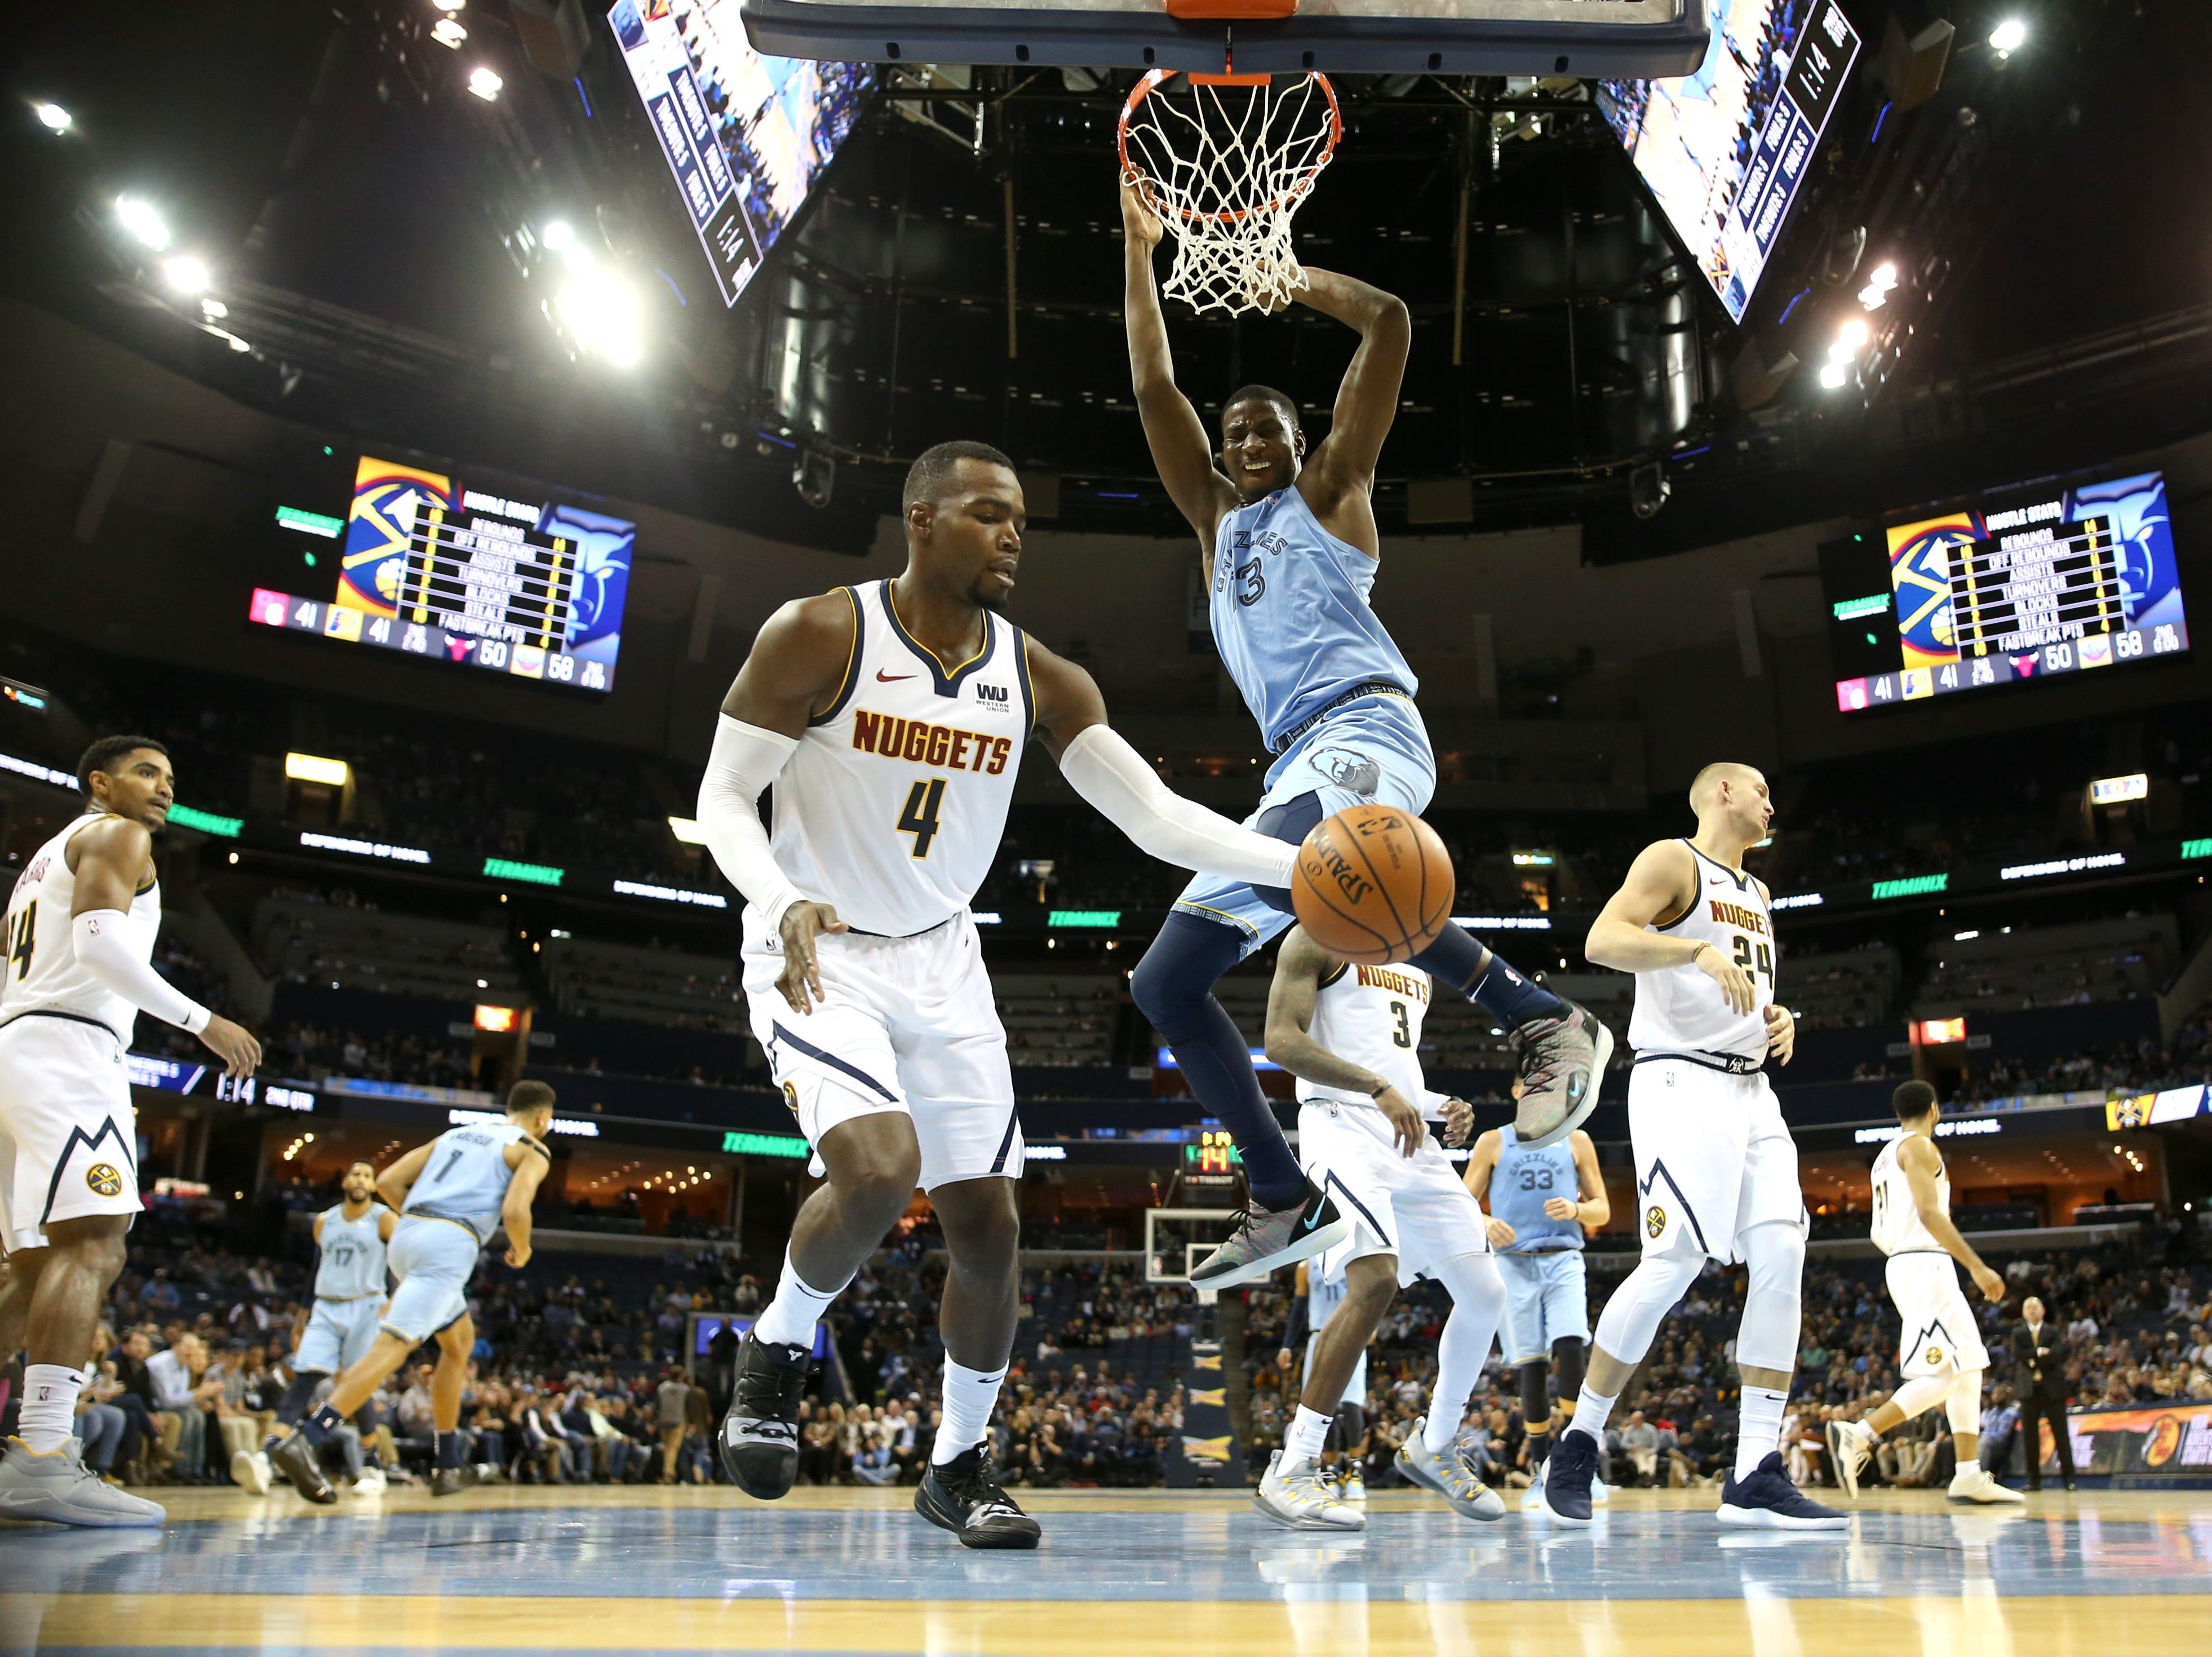 Memphis Grizzlies forward Jaren Jackson Jr. dunks the ball against Denver Nuggets forward Paul Millsap during their game at the FedExForum on Wednesday, November 7, 2018.